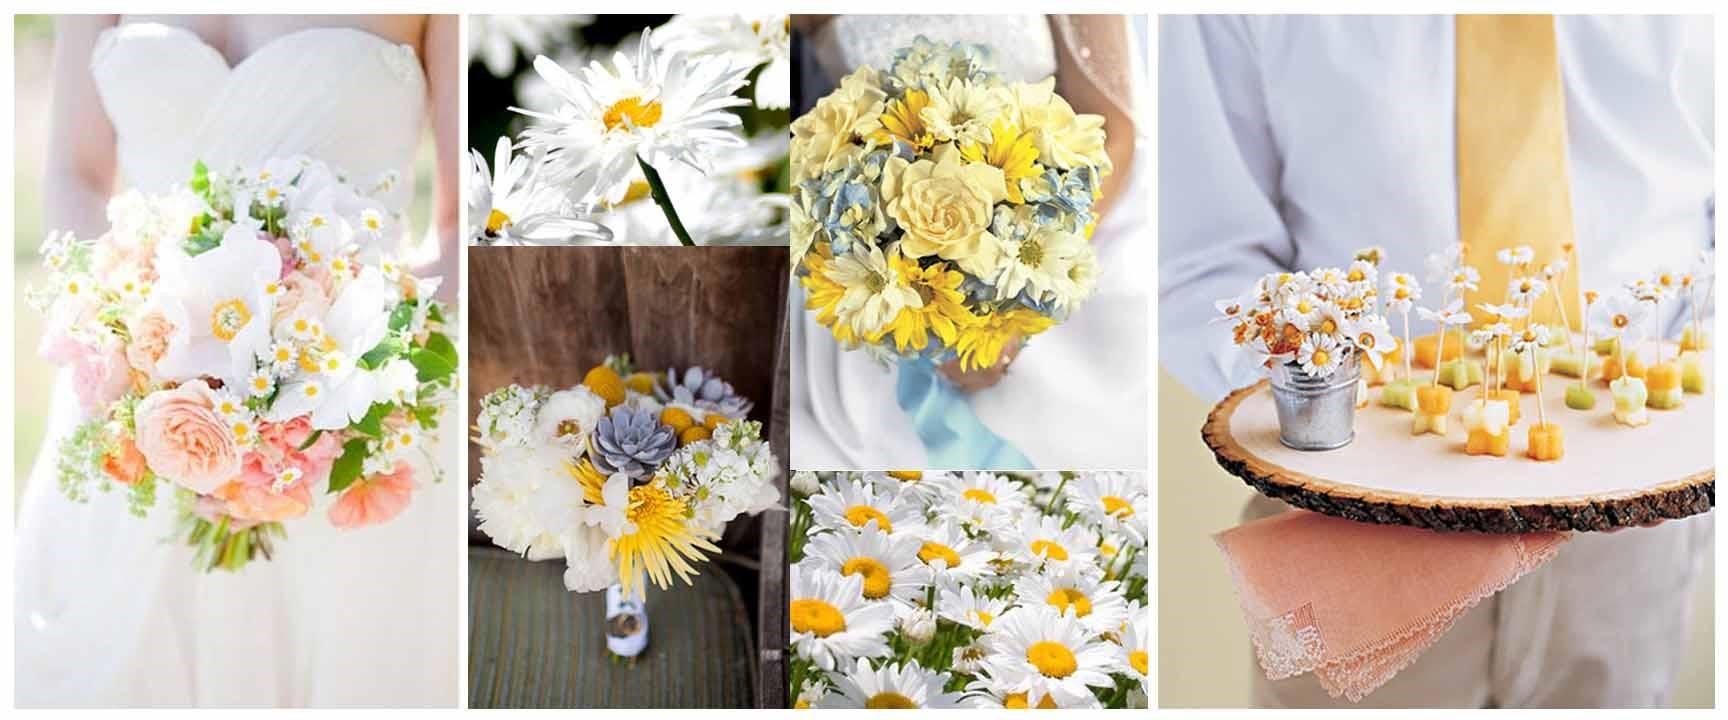 Wedding Flowers Daisy